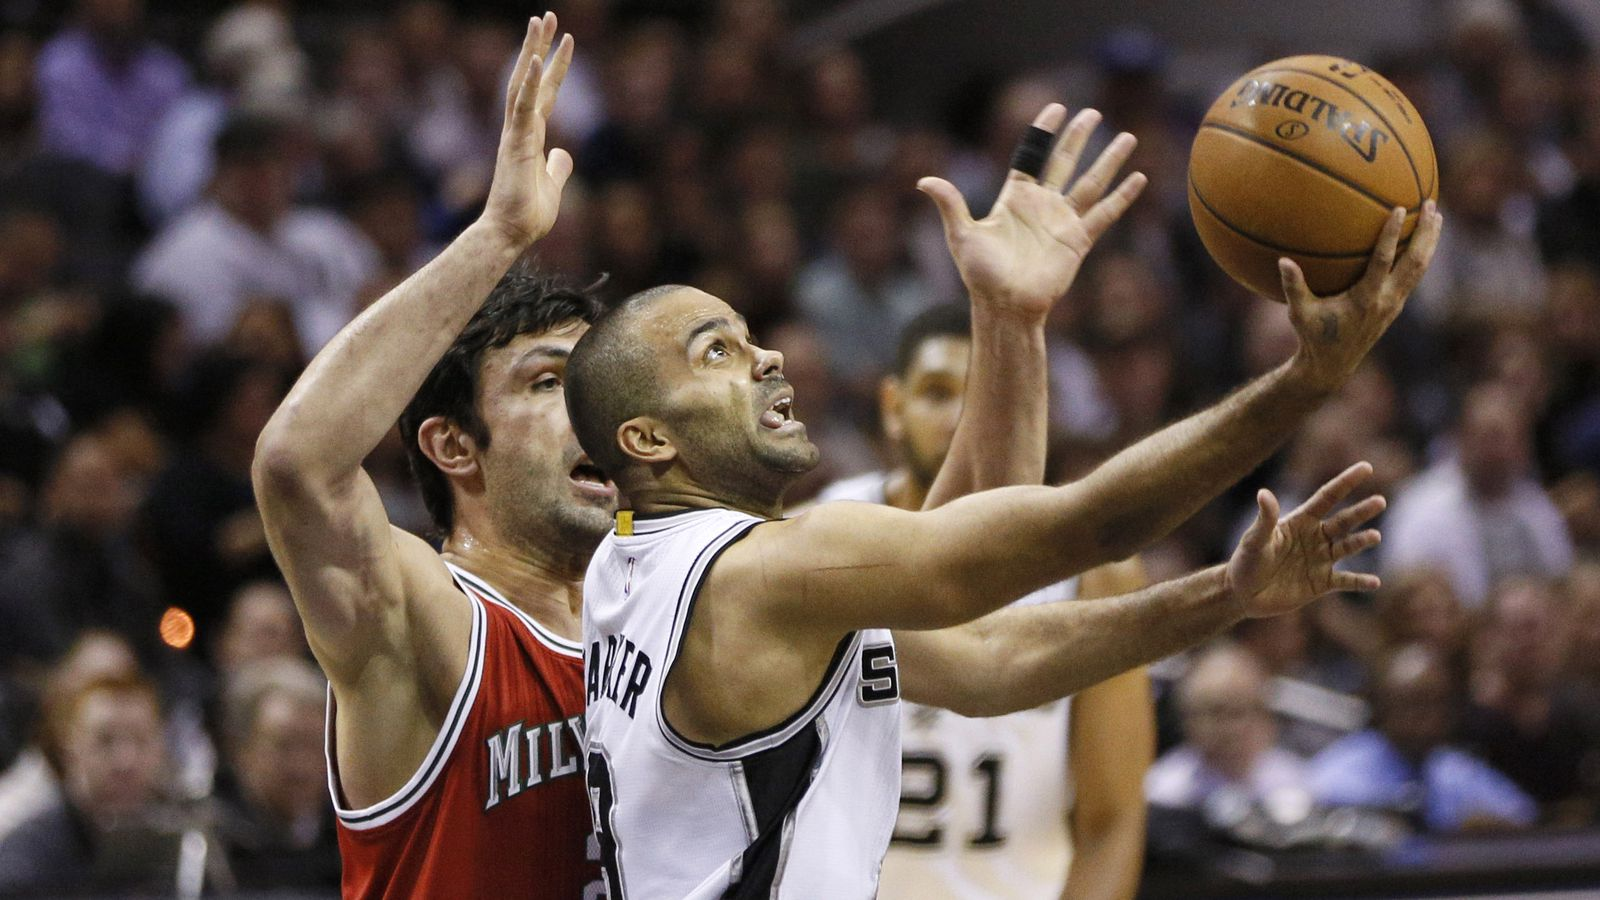 Game Preview: San Antonio Spurs at Milwaukee Bucks - Pounding The Rock